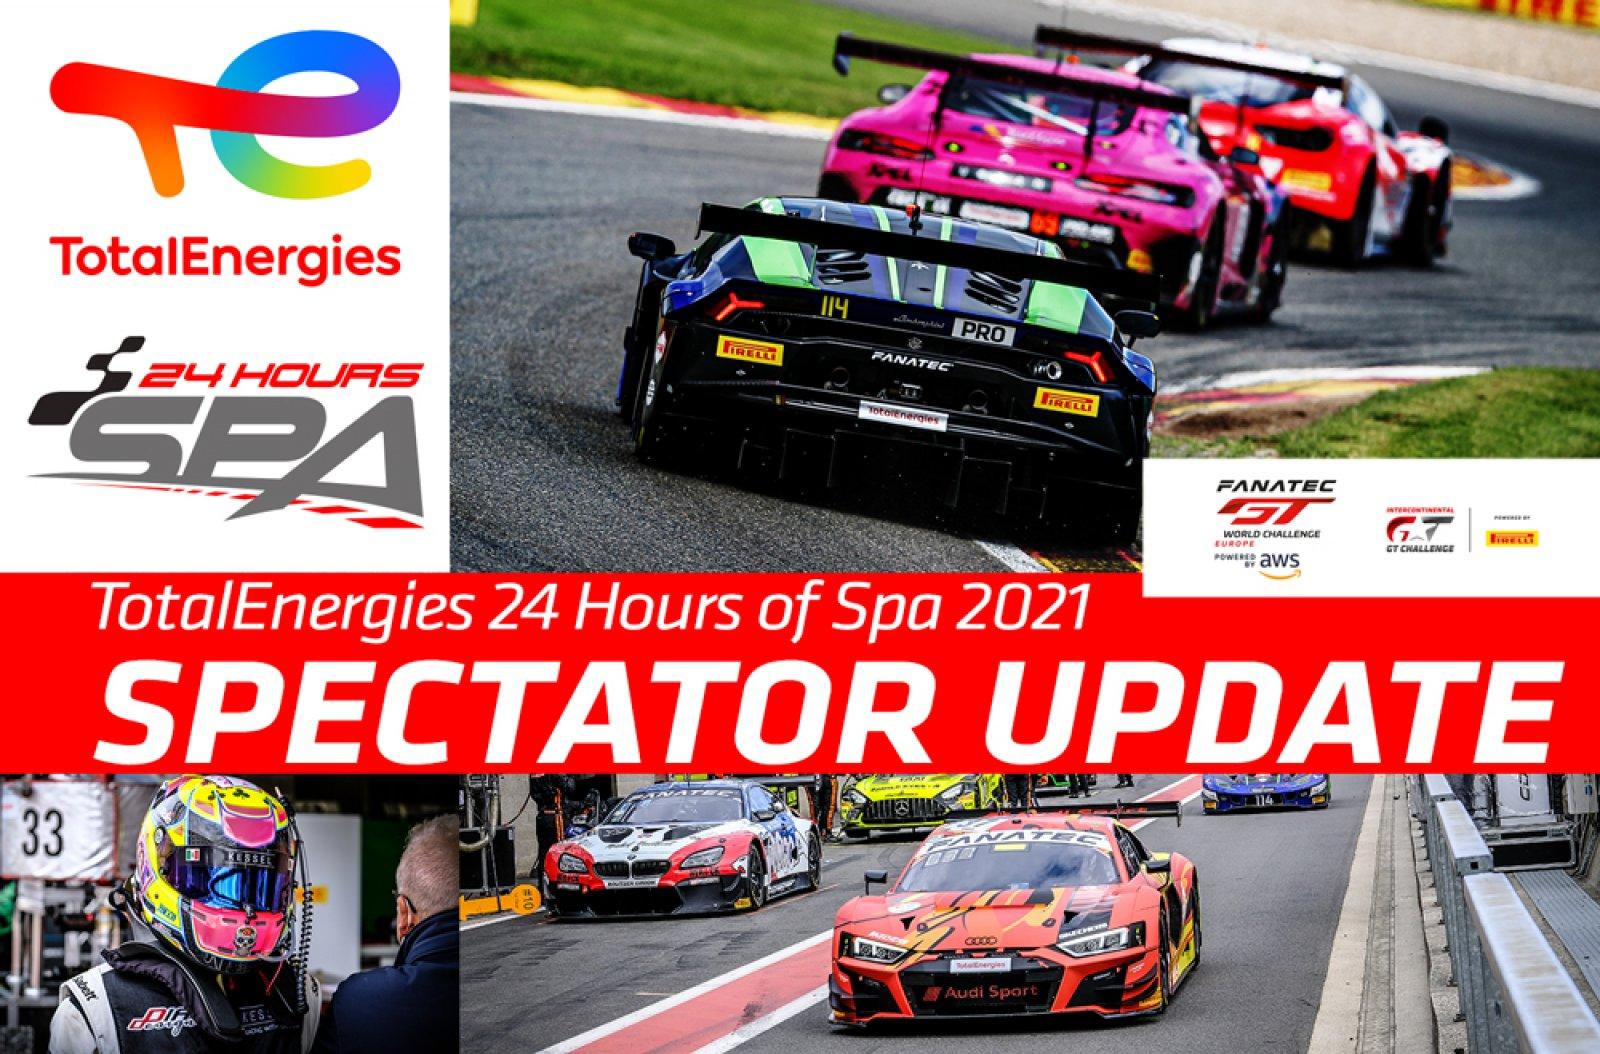 2021 TotalEnergies 24 Hours of Spa spectator update